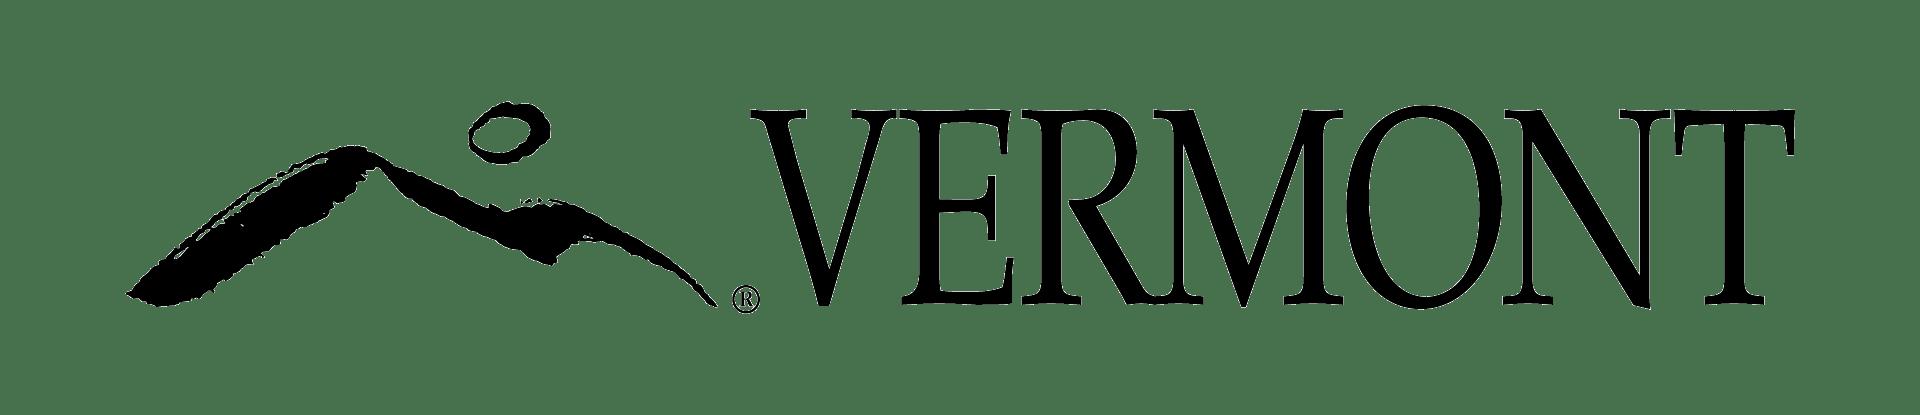 Vermont MOM Logo Horizontal K 1920x415 b39b9b72 2740 4314 aa46 3e8d59c0d141